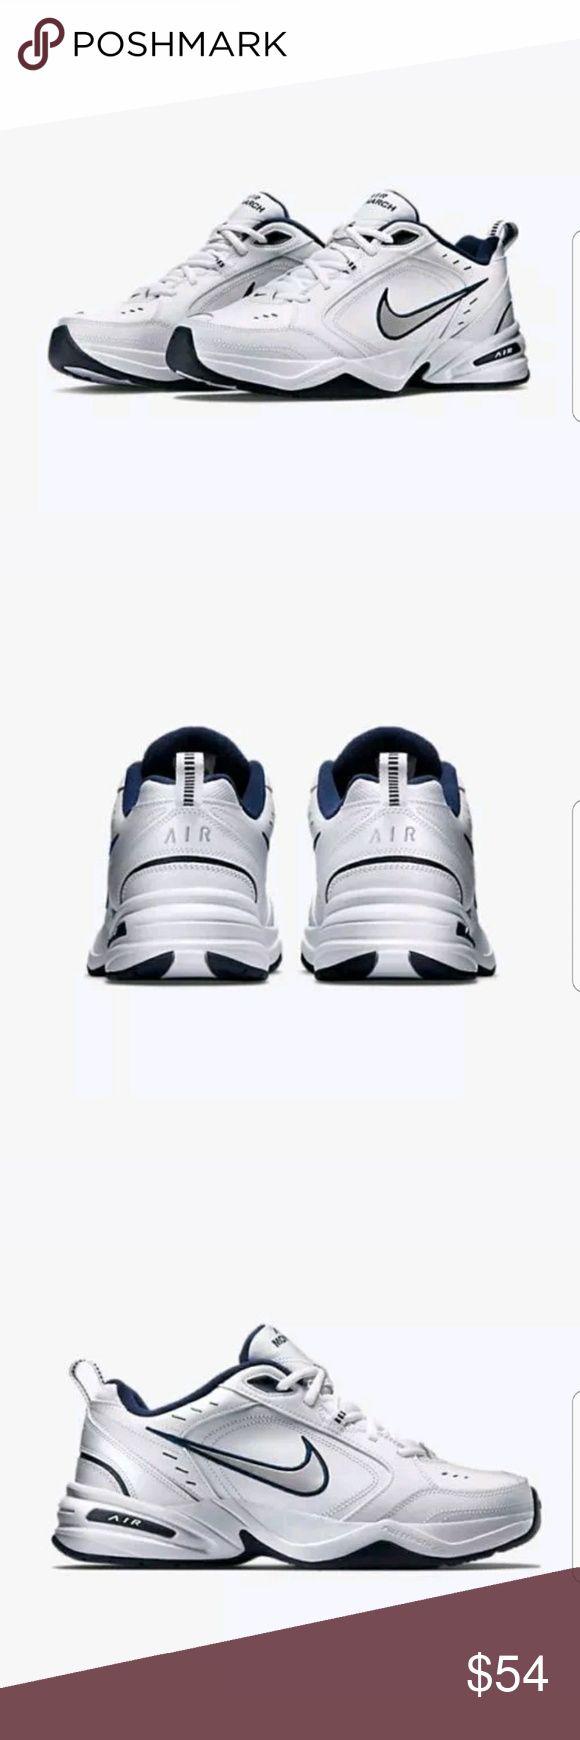 Nike Air Monarch 4 White Silver 415445-102 Navy Nike Air Monarch 4 Medium 415445-102 White Silver Navy Mens?  NEW WITHOUT BOX  SZ: 10.5     2.8 Nike Shoes Sneakers